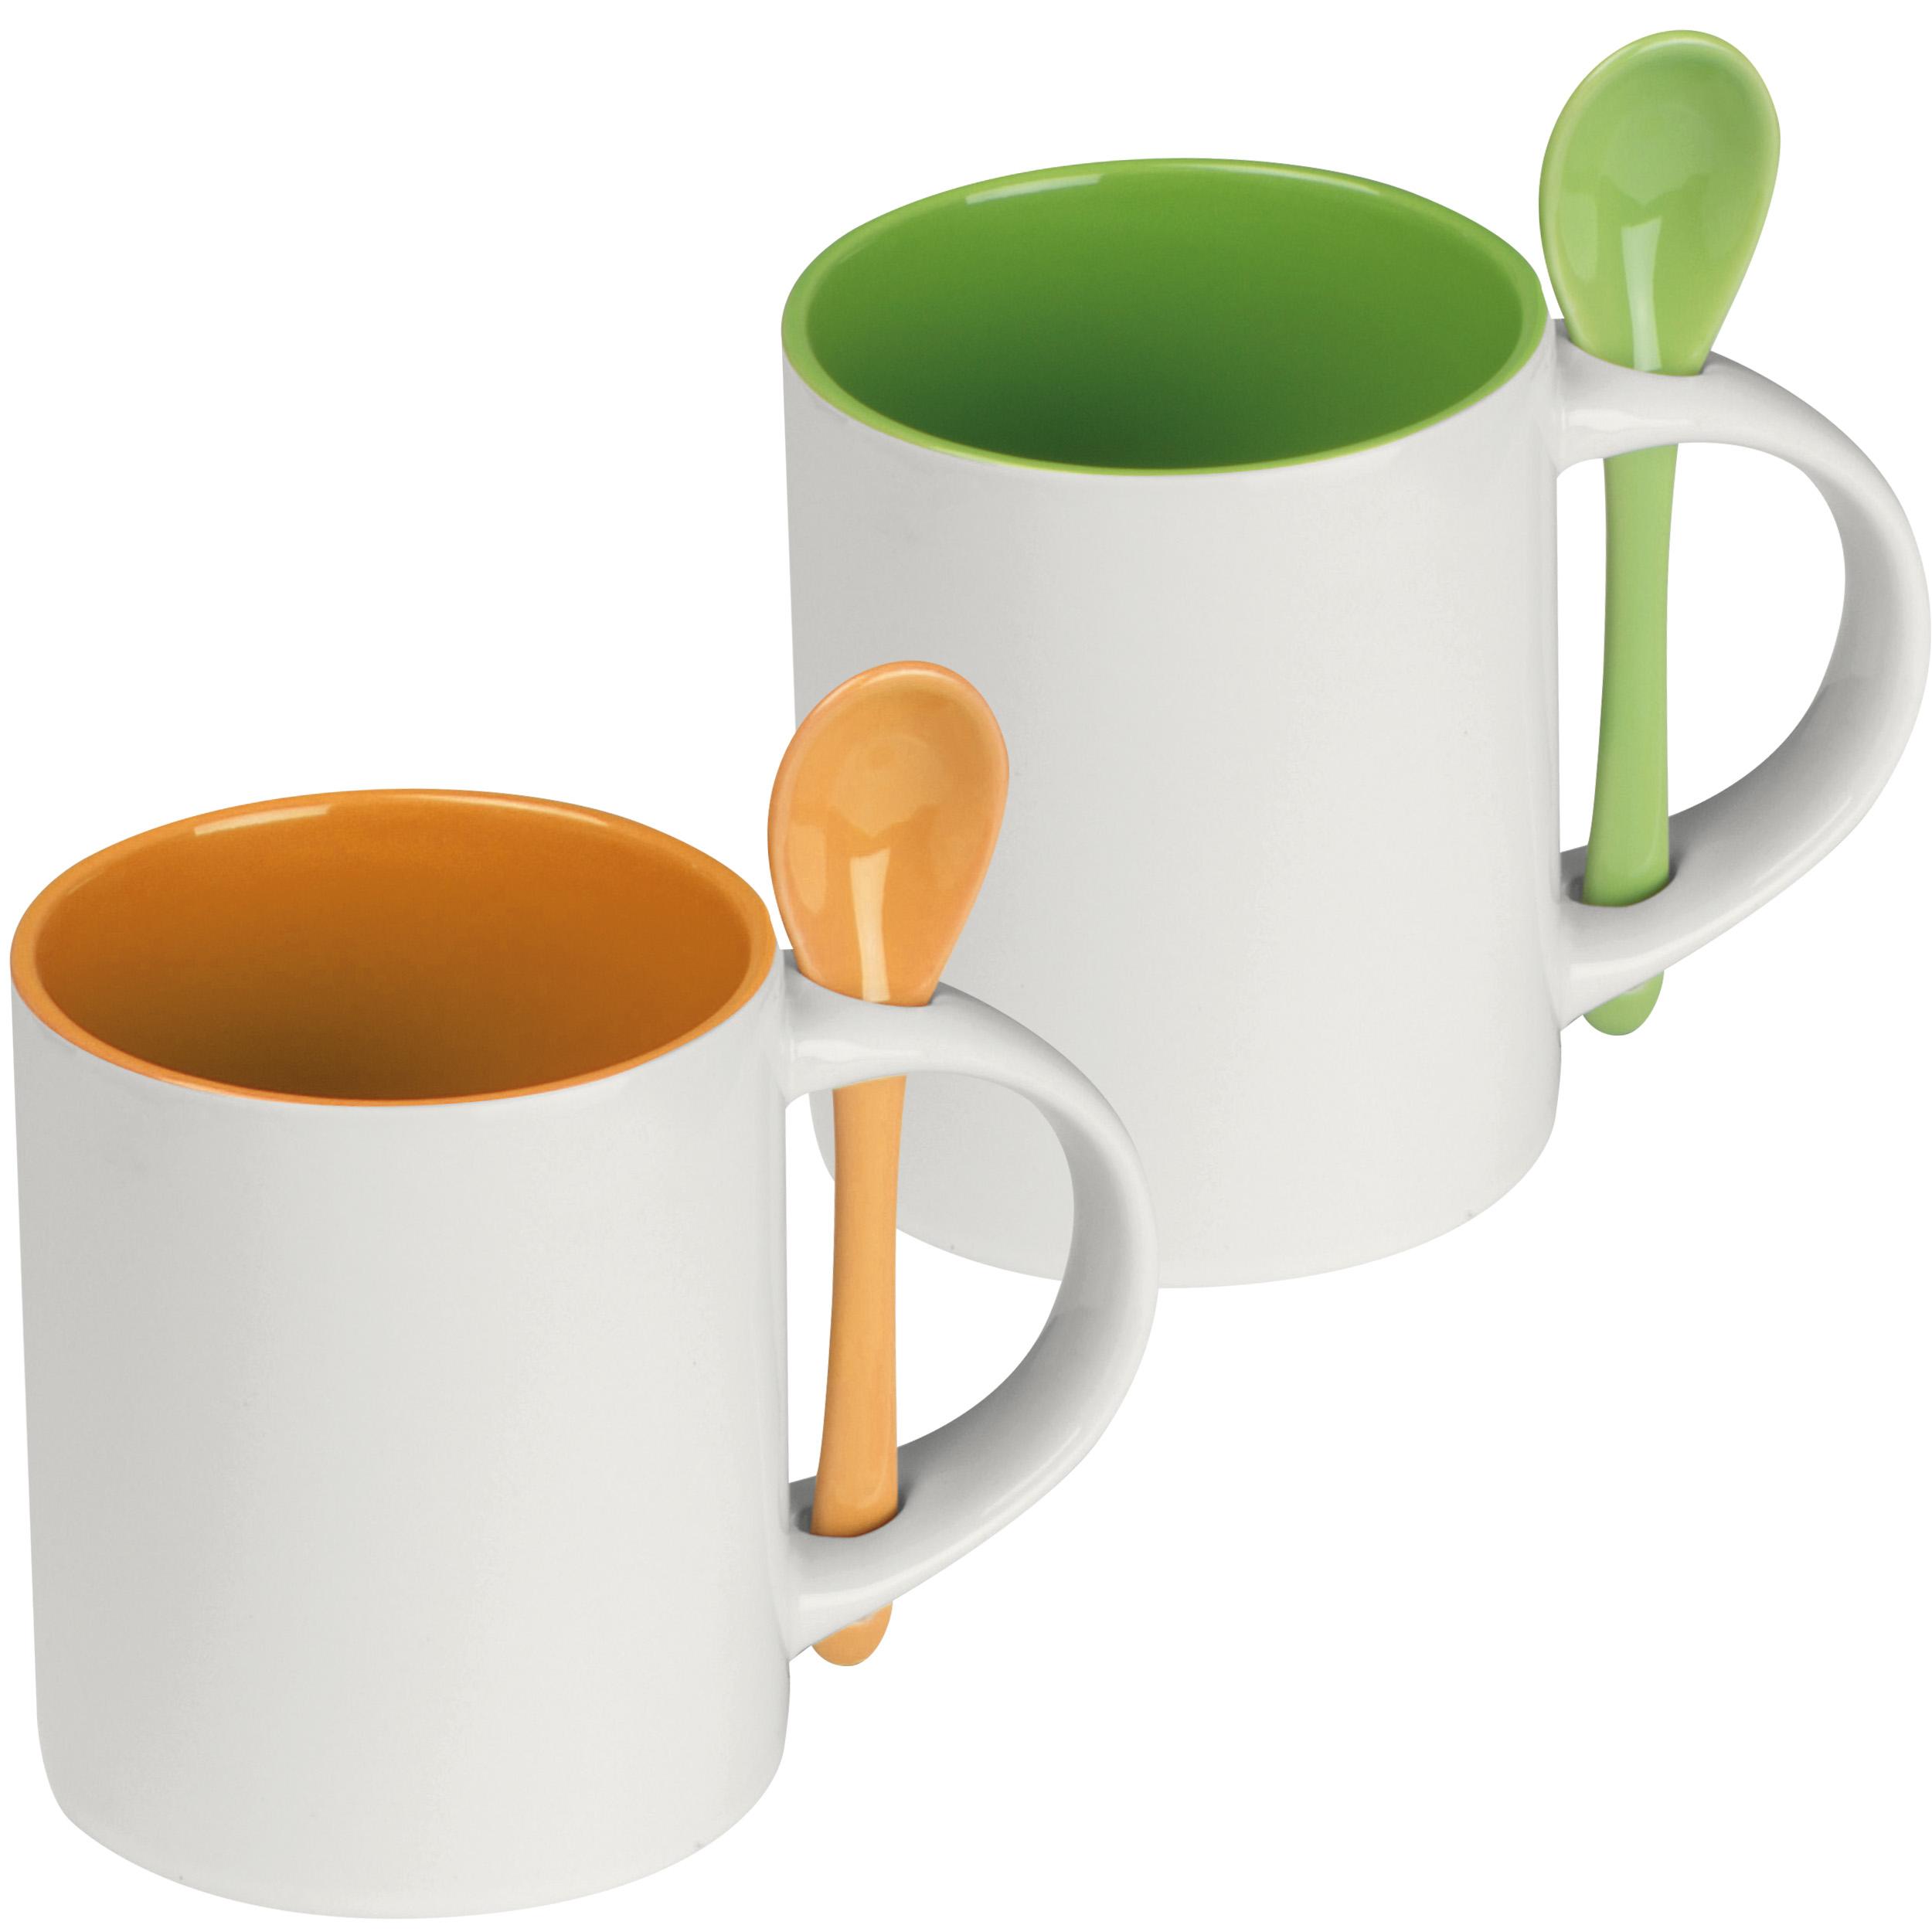 Tasse aus Keramik mit Löffel, 300 ml